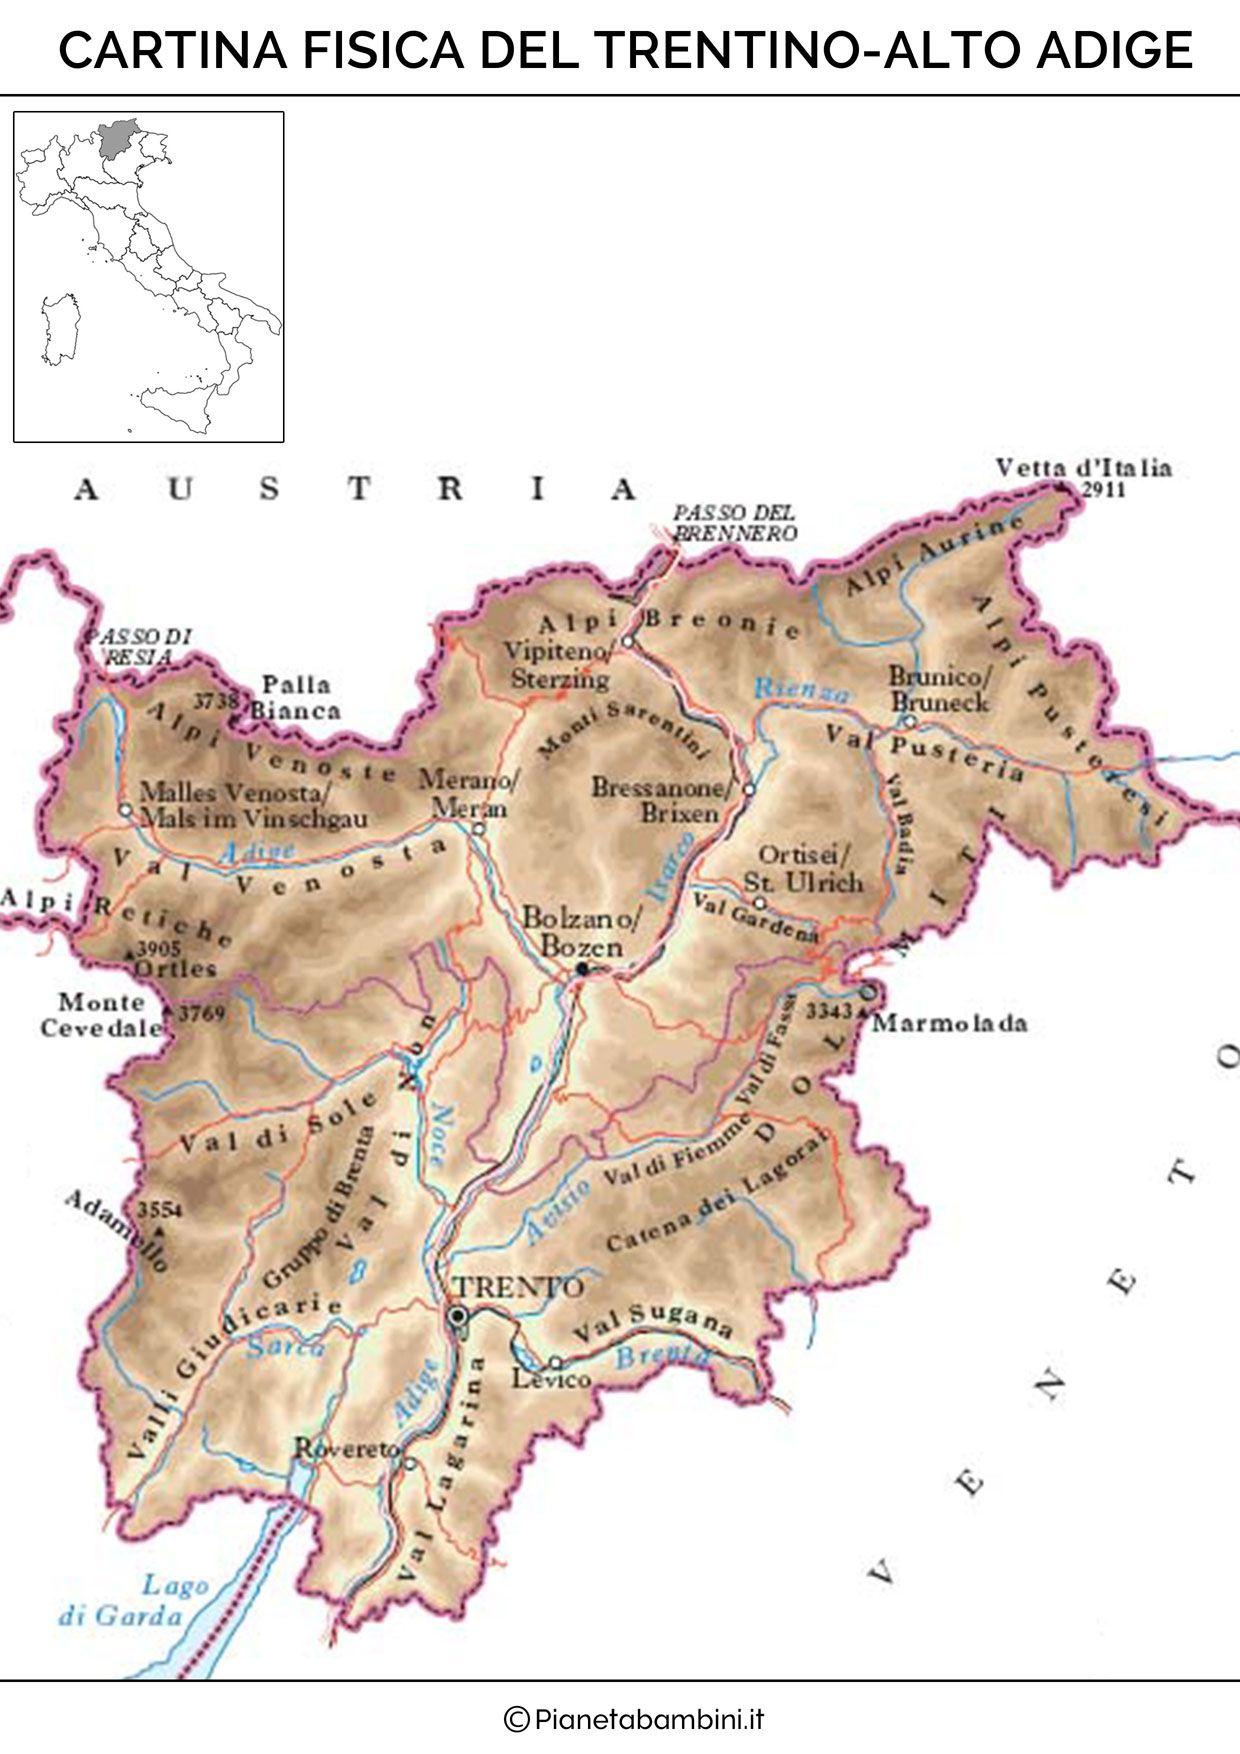 Fiumi Del Trentino Alto Adige Cartina.Cartina Fisica Trentino Alto Adige Alto Adige Geografia Mappa